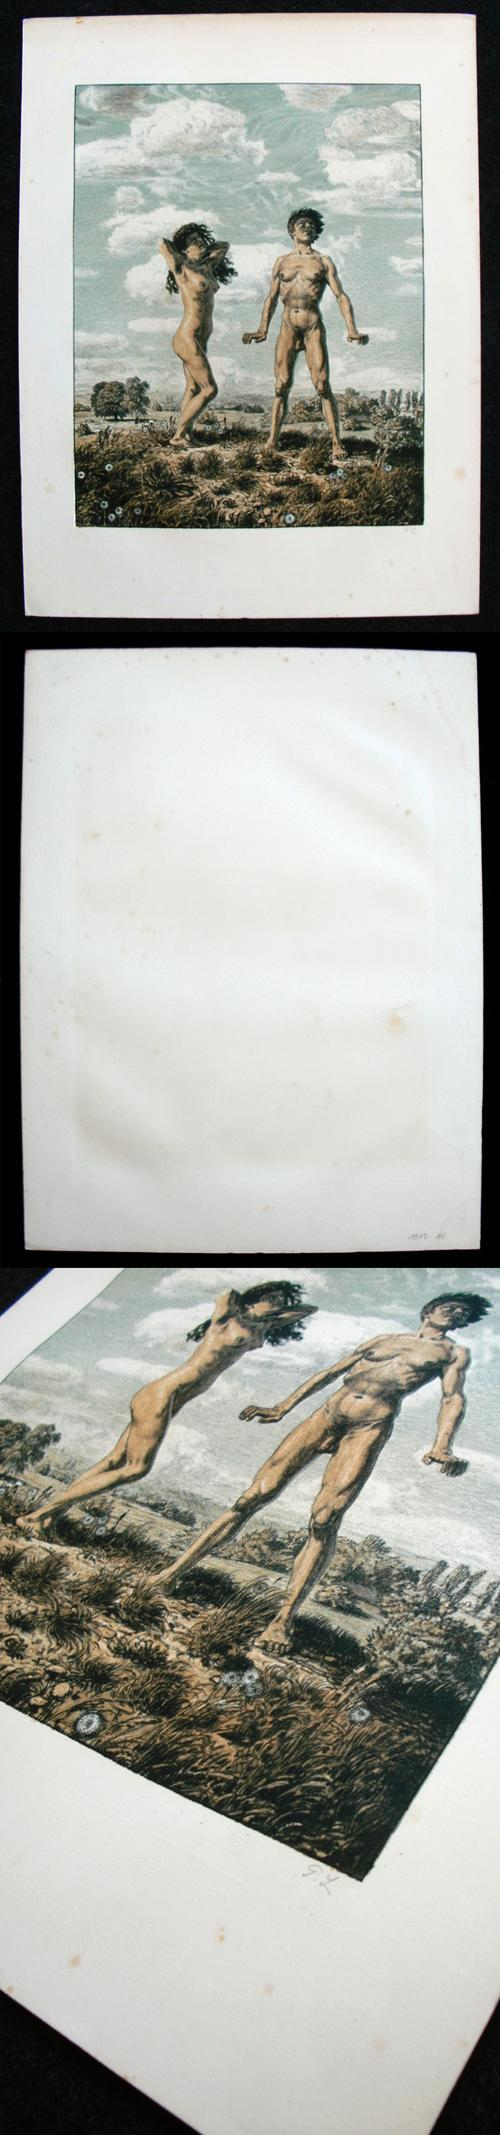 Georg Löhrig - Paar. Farblithographie, um 1895-1900. kopen? Bied vanaf 350!